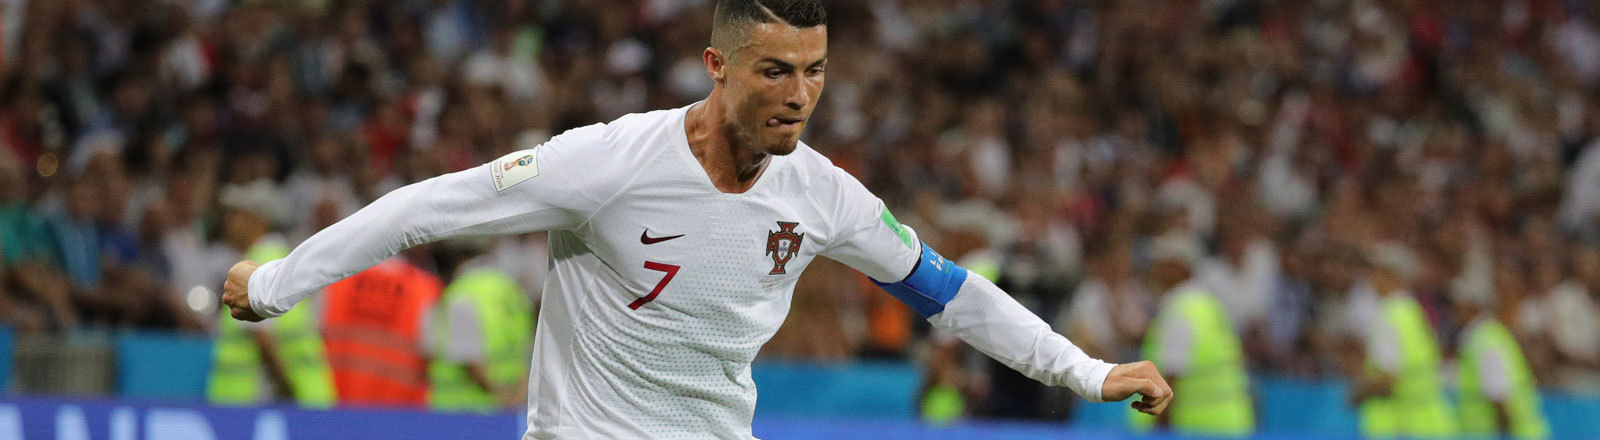 Christian Ronaldo Fifa WM 2018 Russland Spiel gegen Uruguay